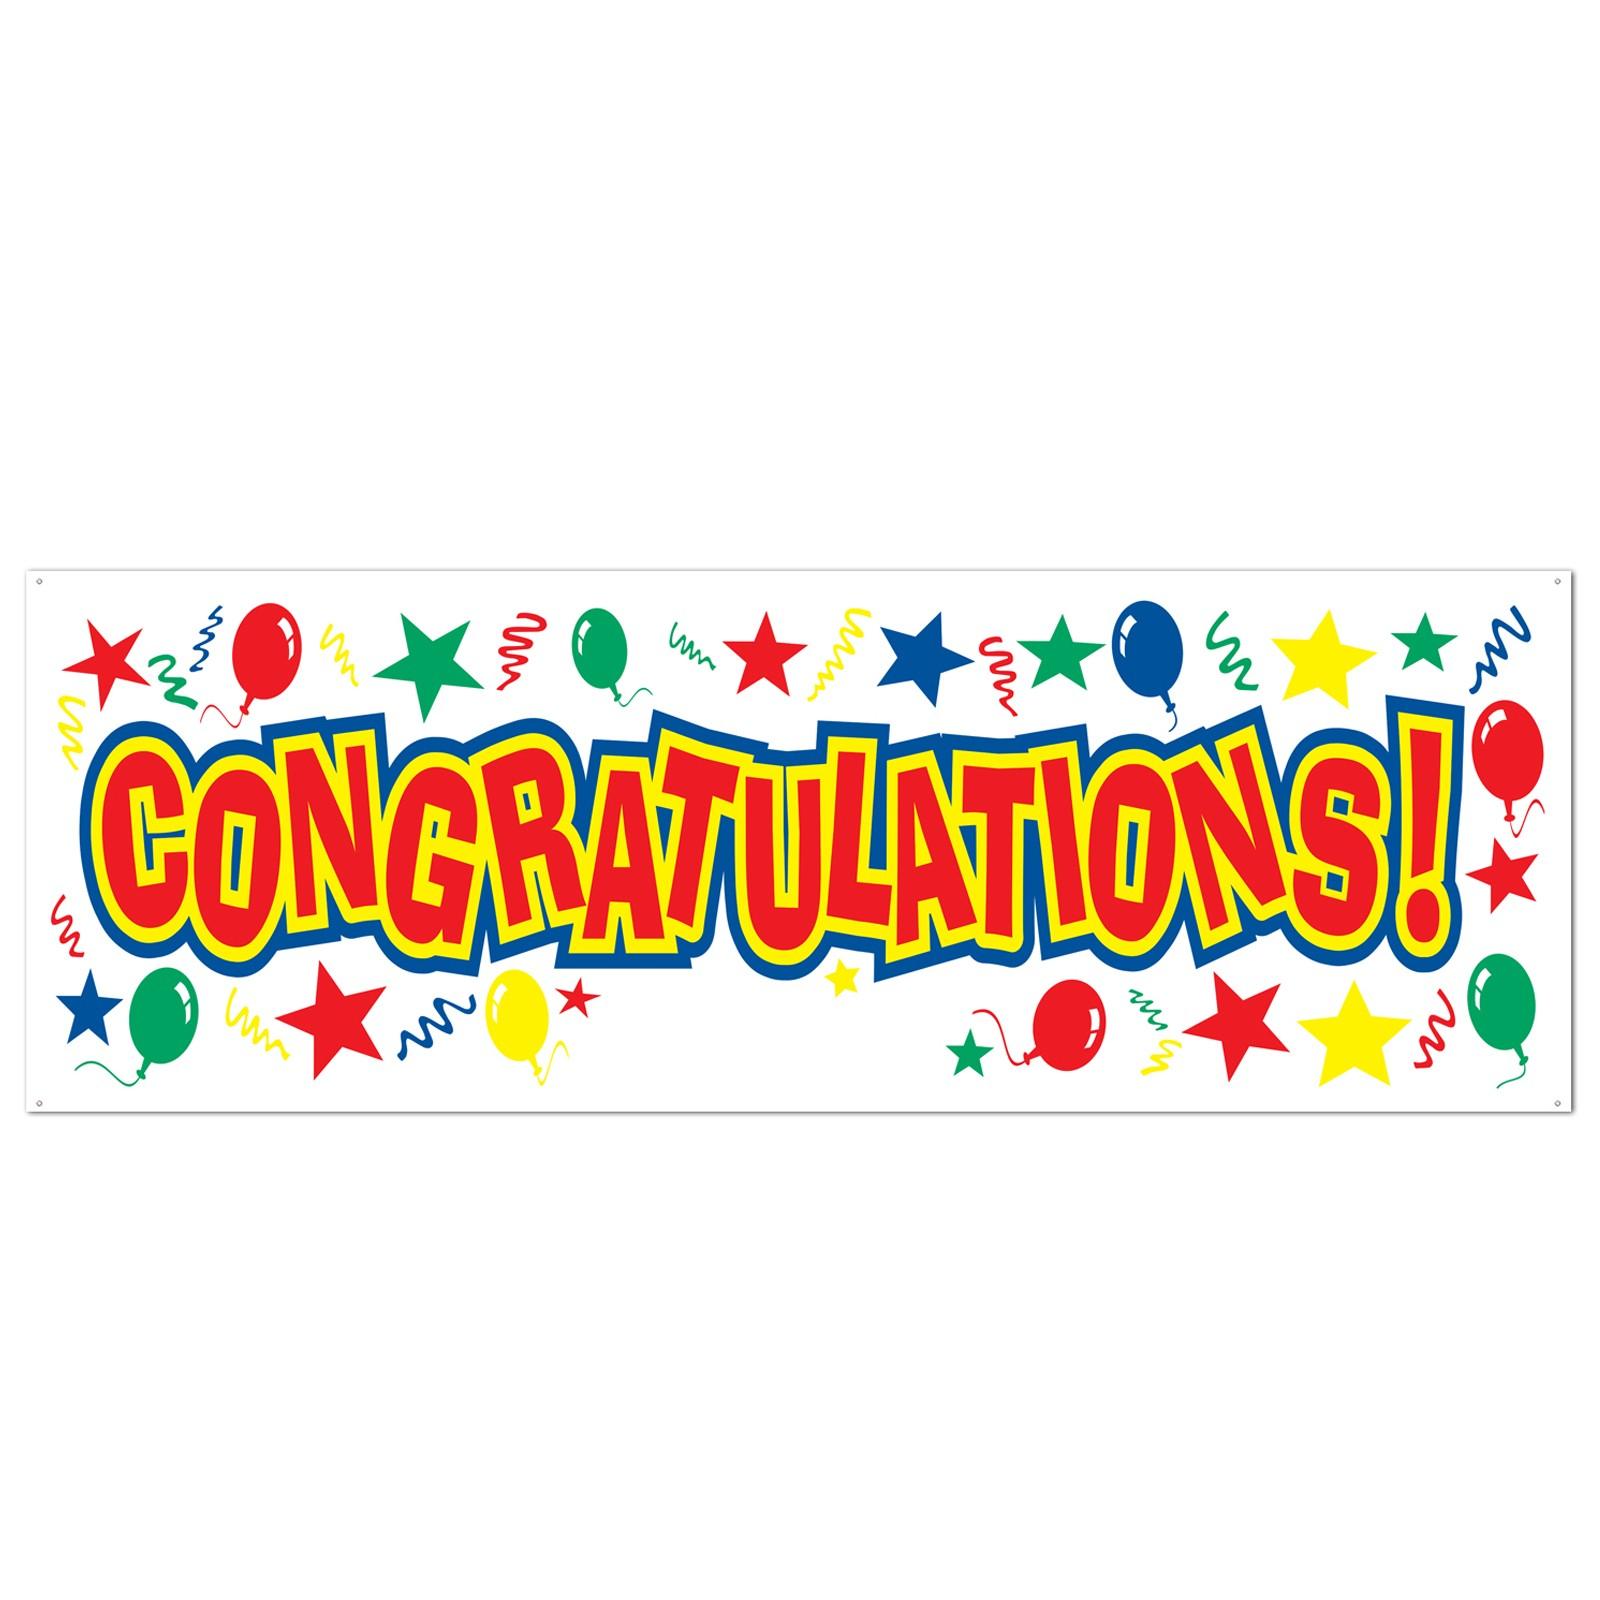 1600x1600 Congratulations Job Promotion. Congratulations For Promotion